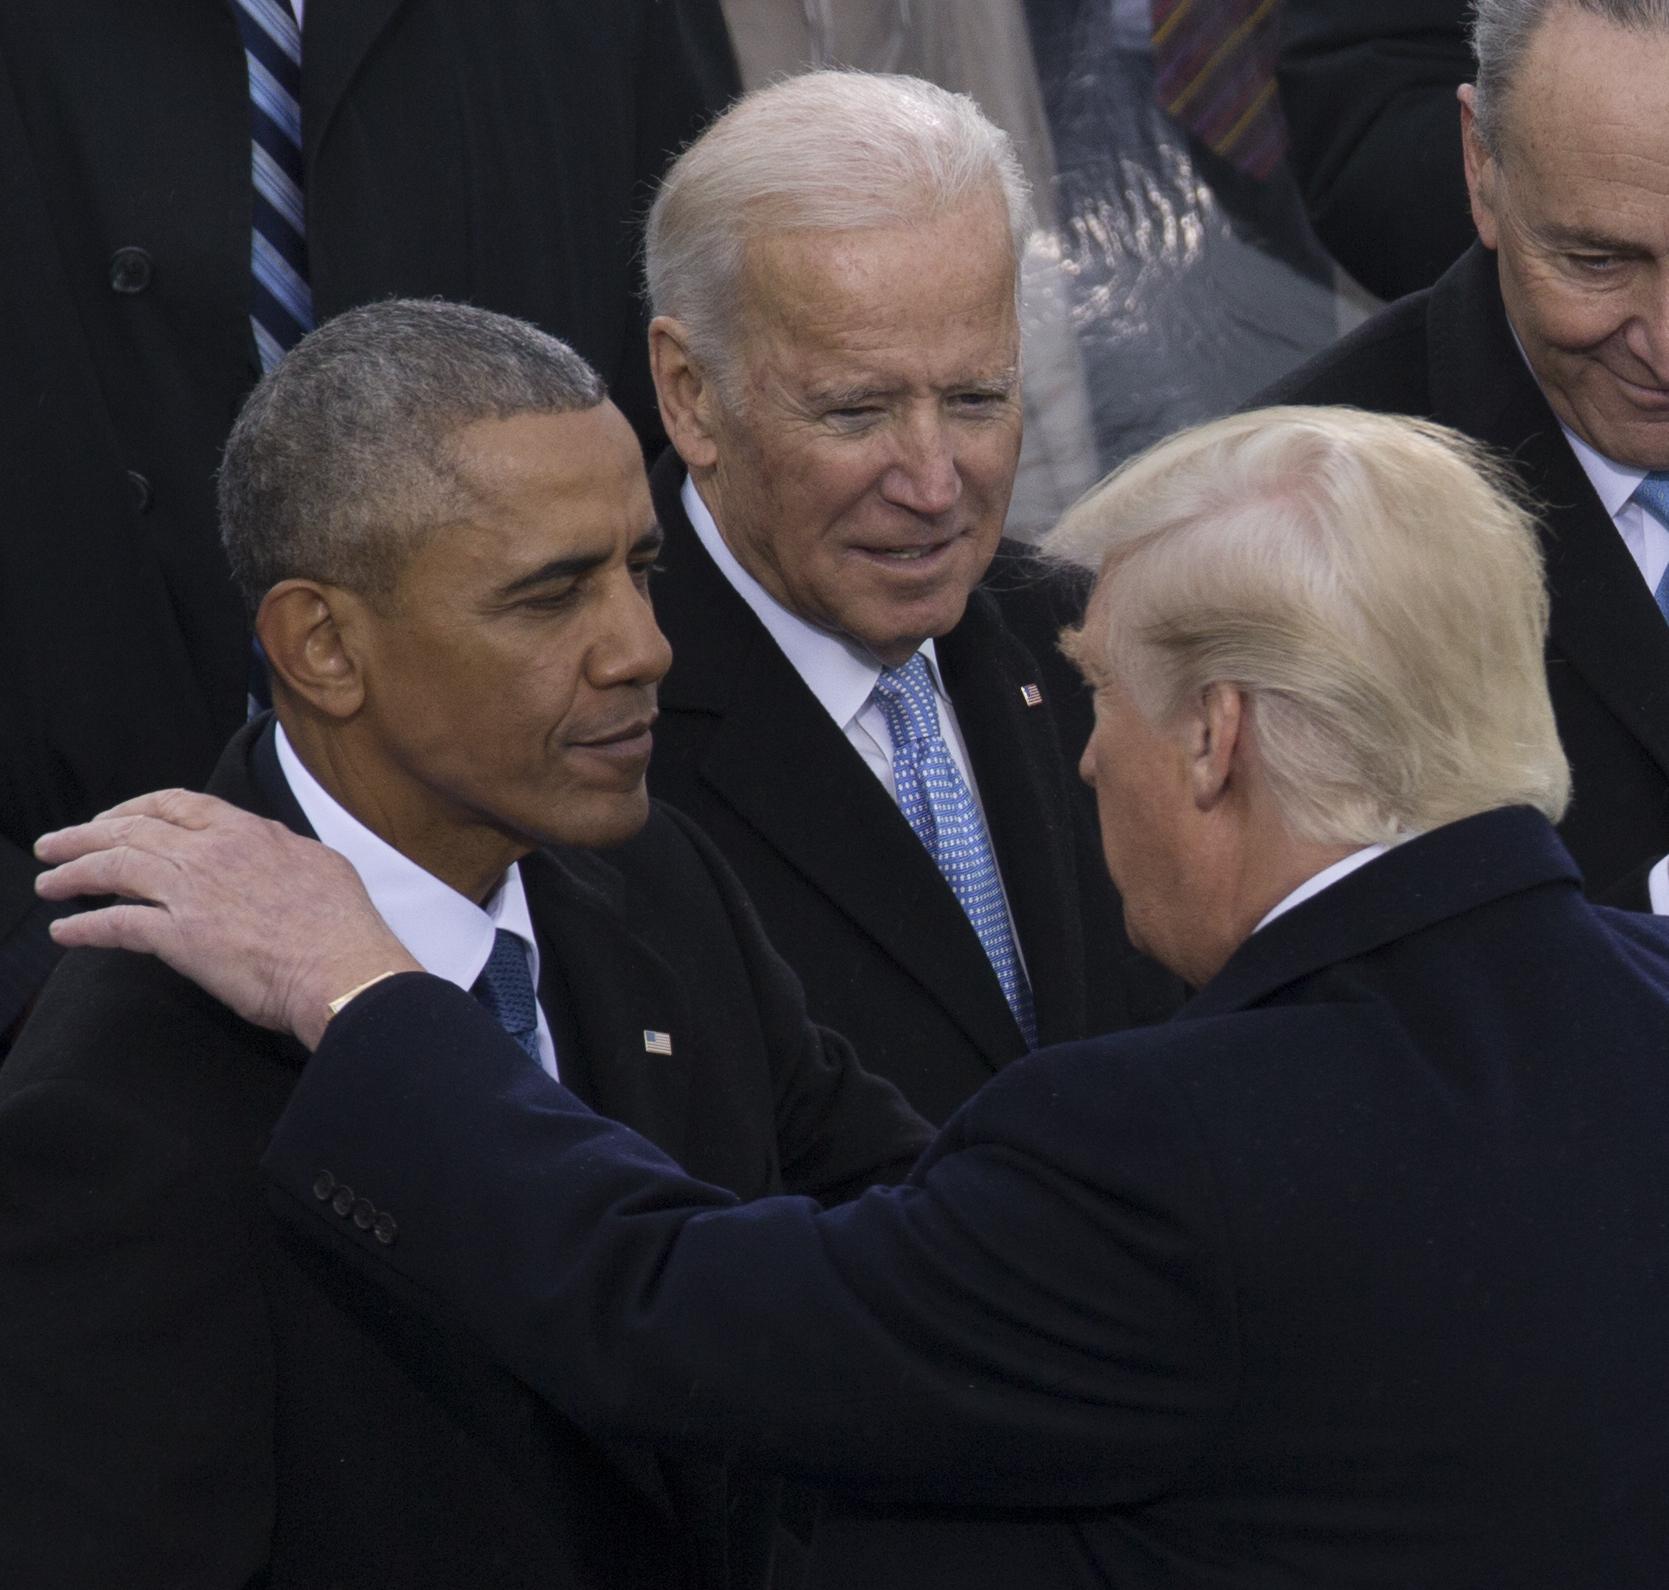 File:Barack Obama, Donald Trump, Joe Biden at Inauguration 01-20-17  (cropped).jpg - Wikimedia Commons